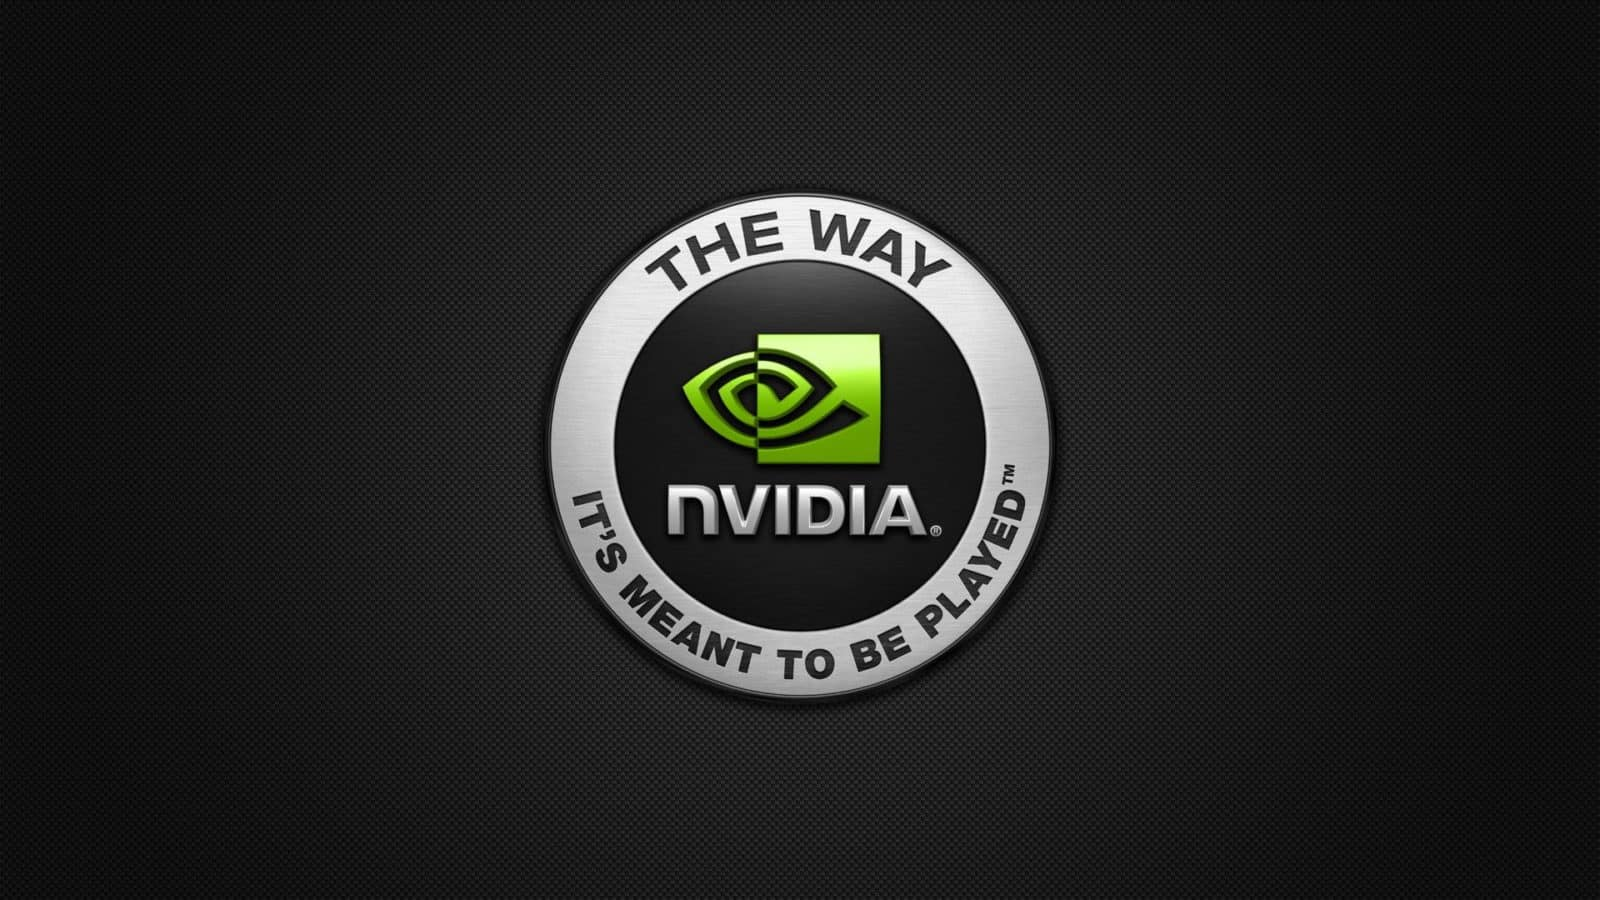 NVIDIA Patent war